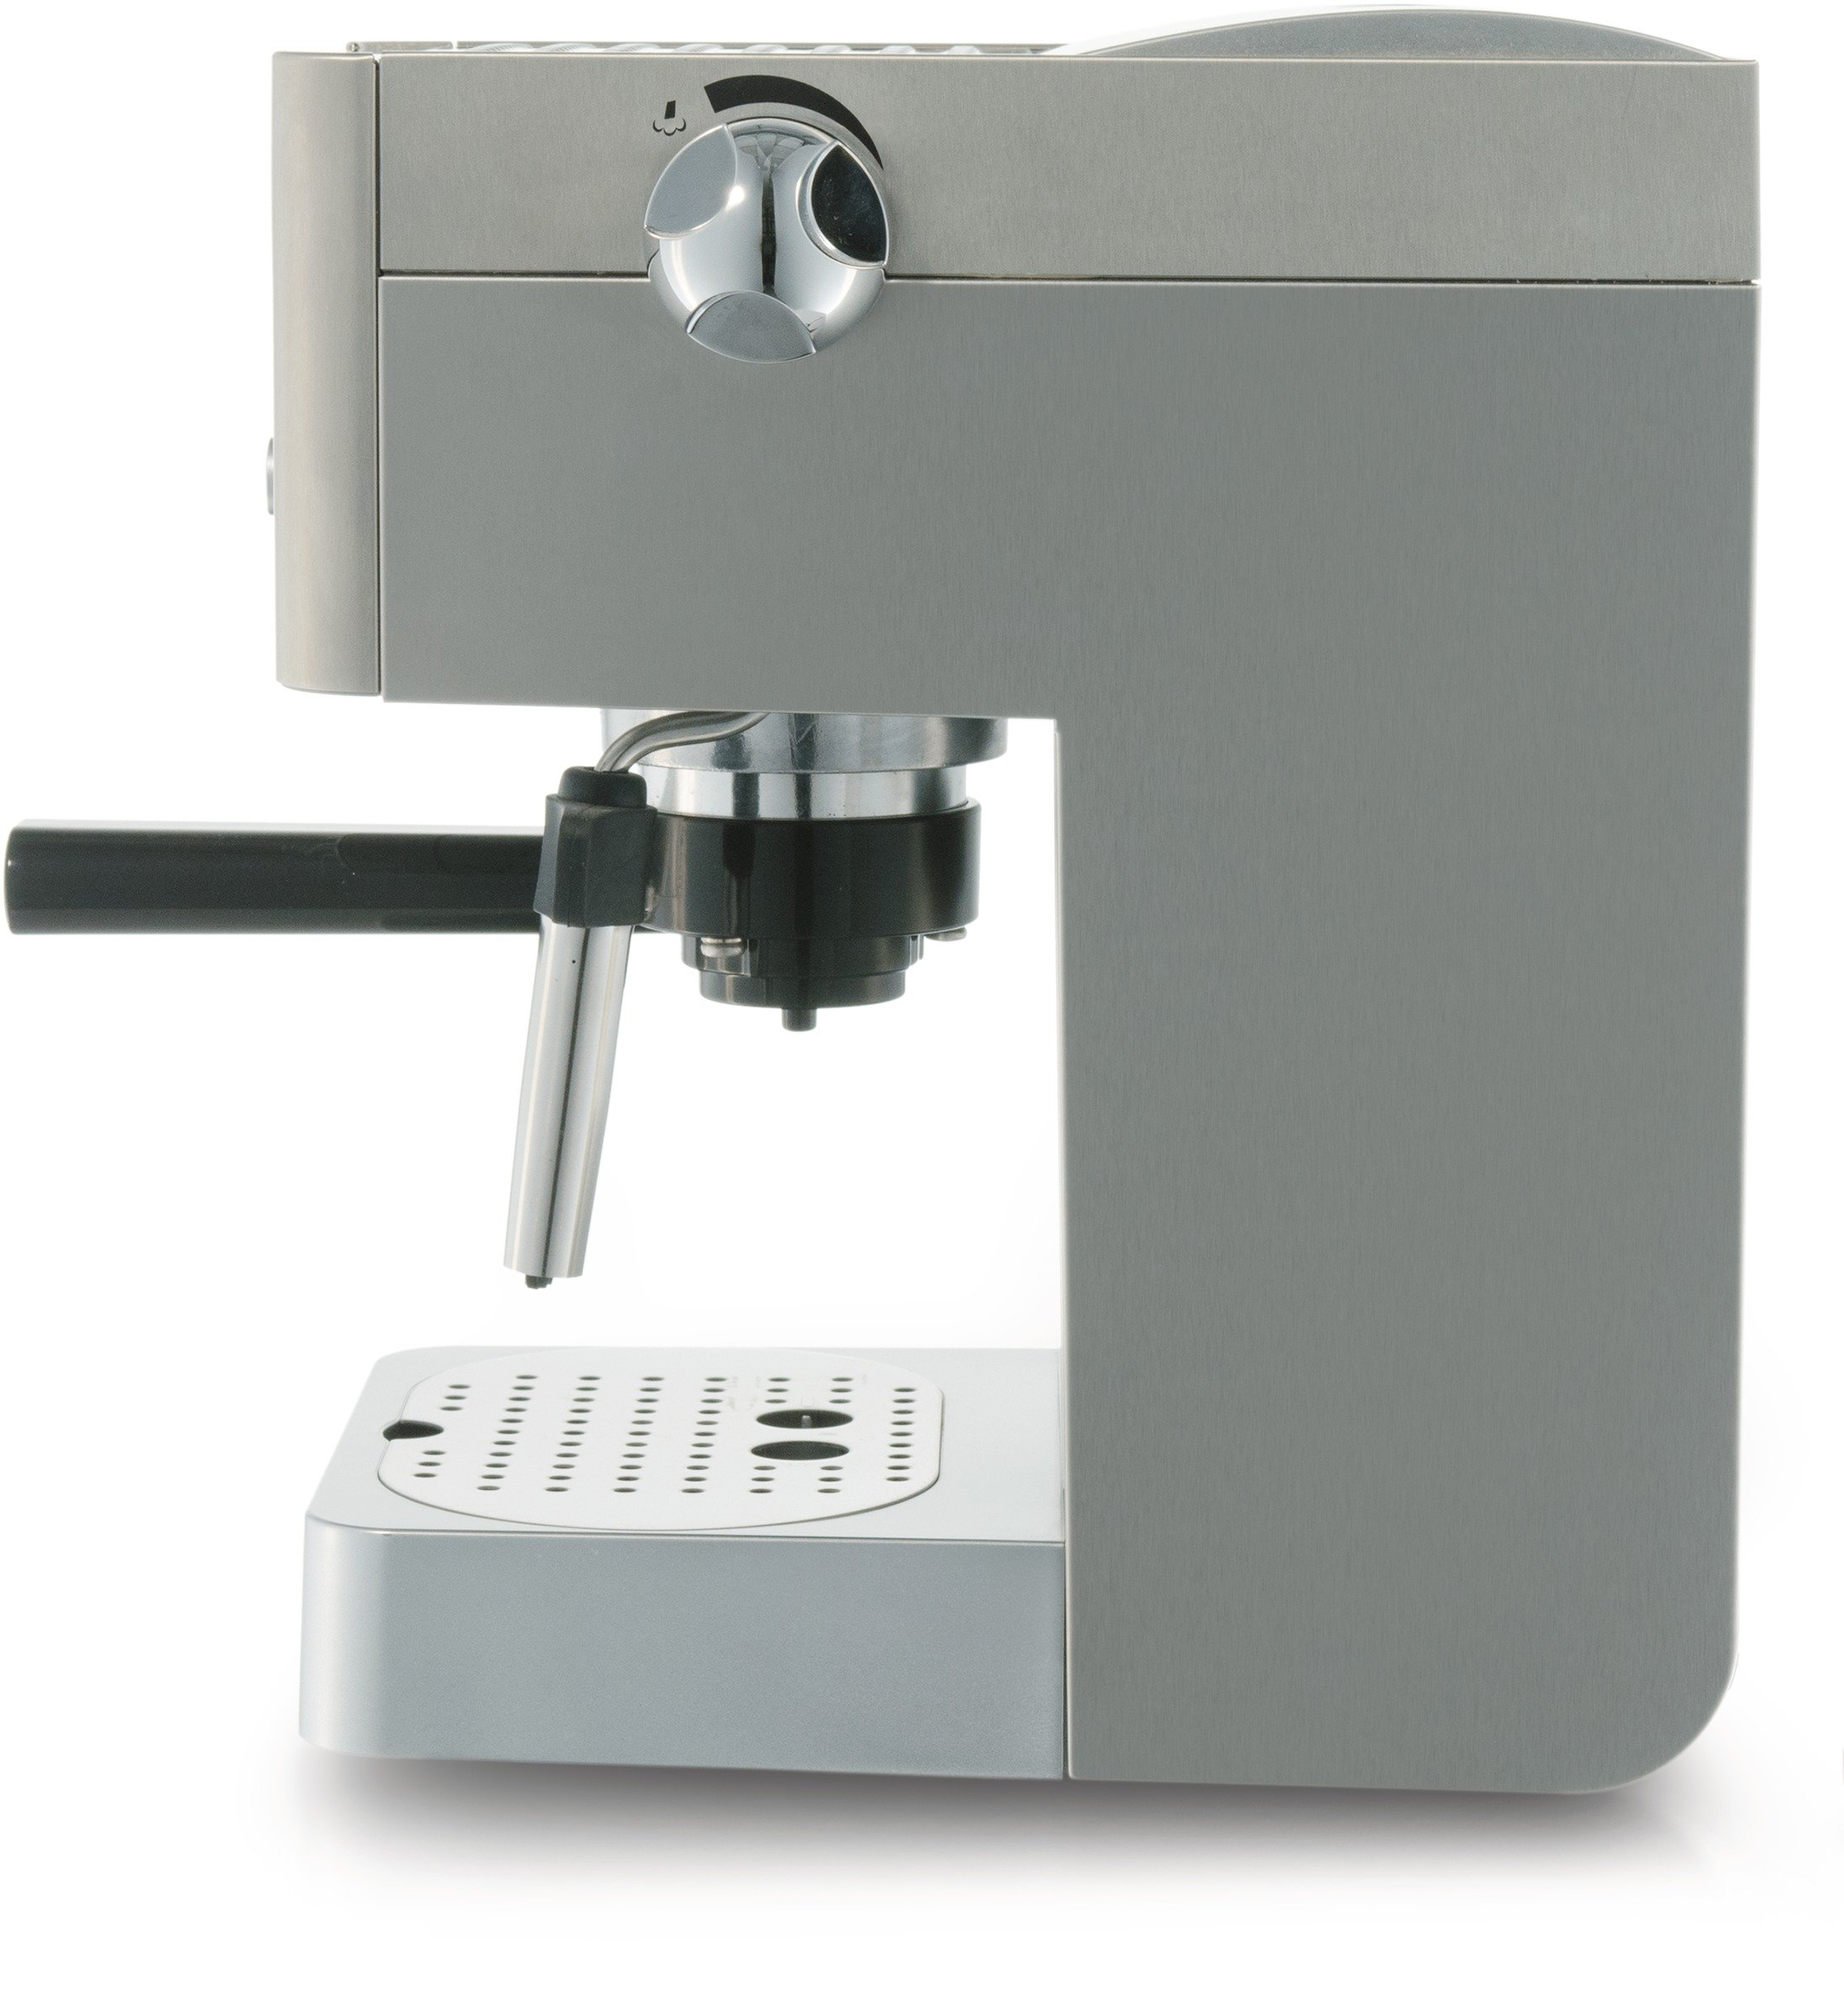 Gaggia-RI832701-Gran-Manual-Espresso-Machine-1-Litre-950-Watt-15-Bar-Stainless-Steel